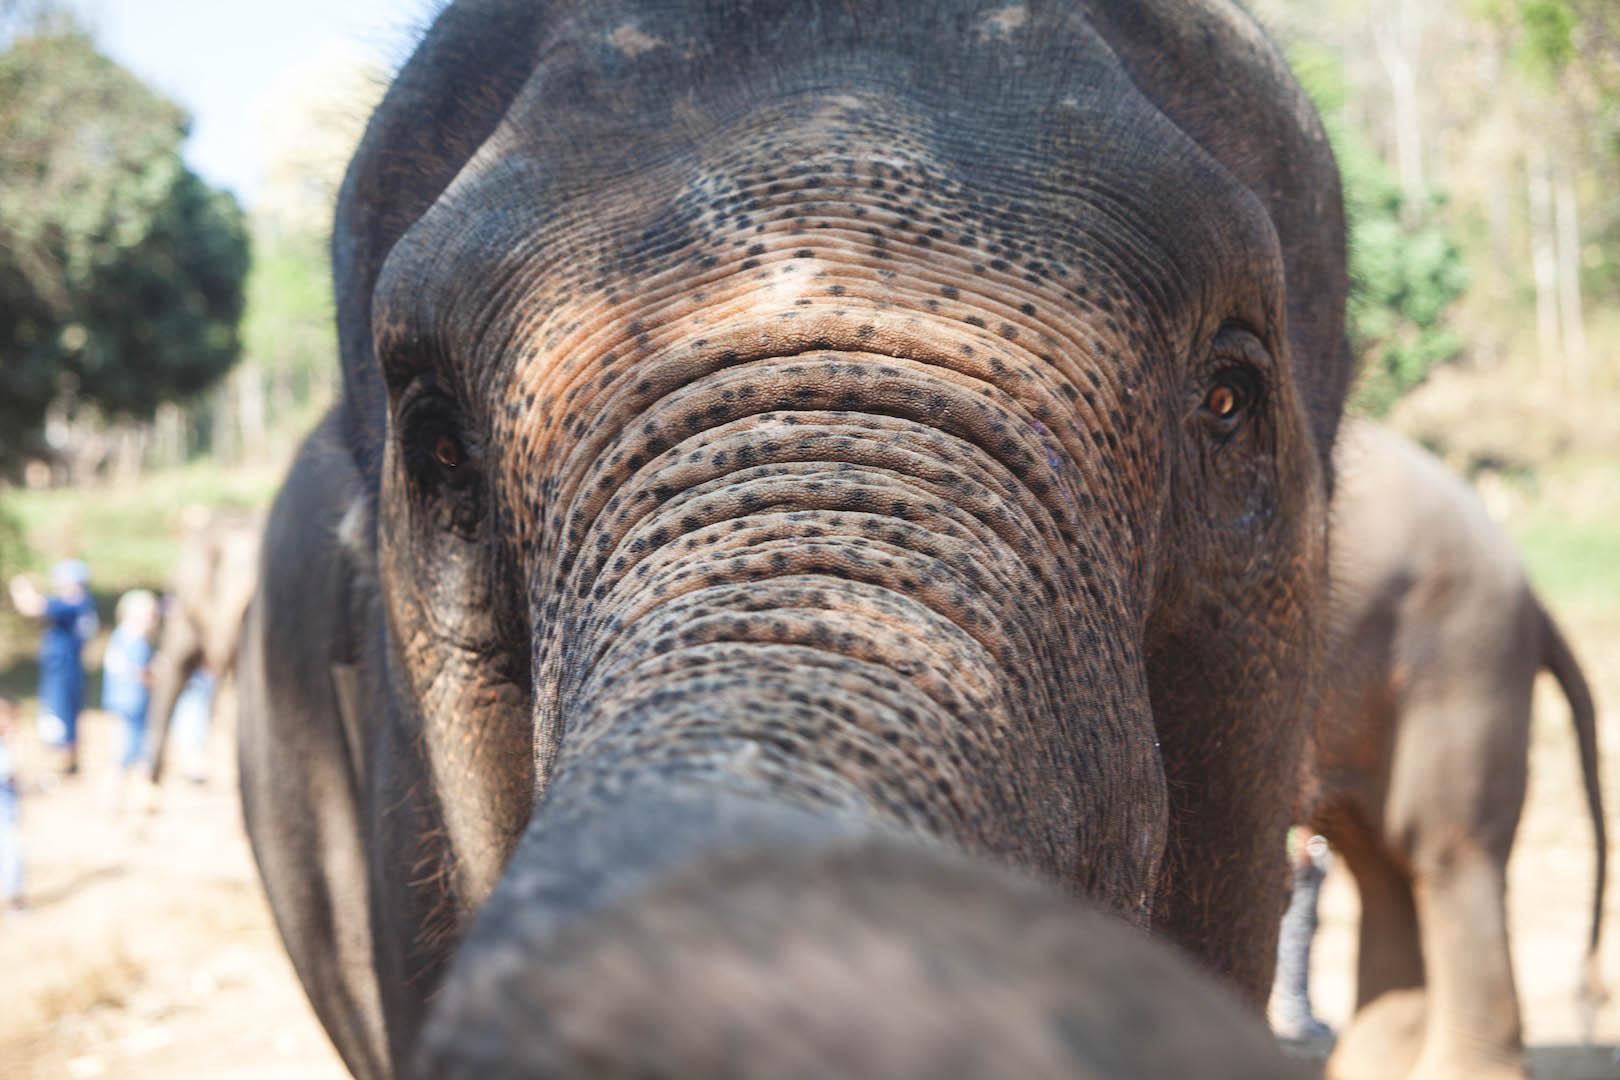 Elephant Face, Baan Chang Elephant Park, Chiang Mai, Thailand